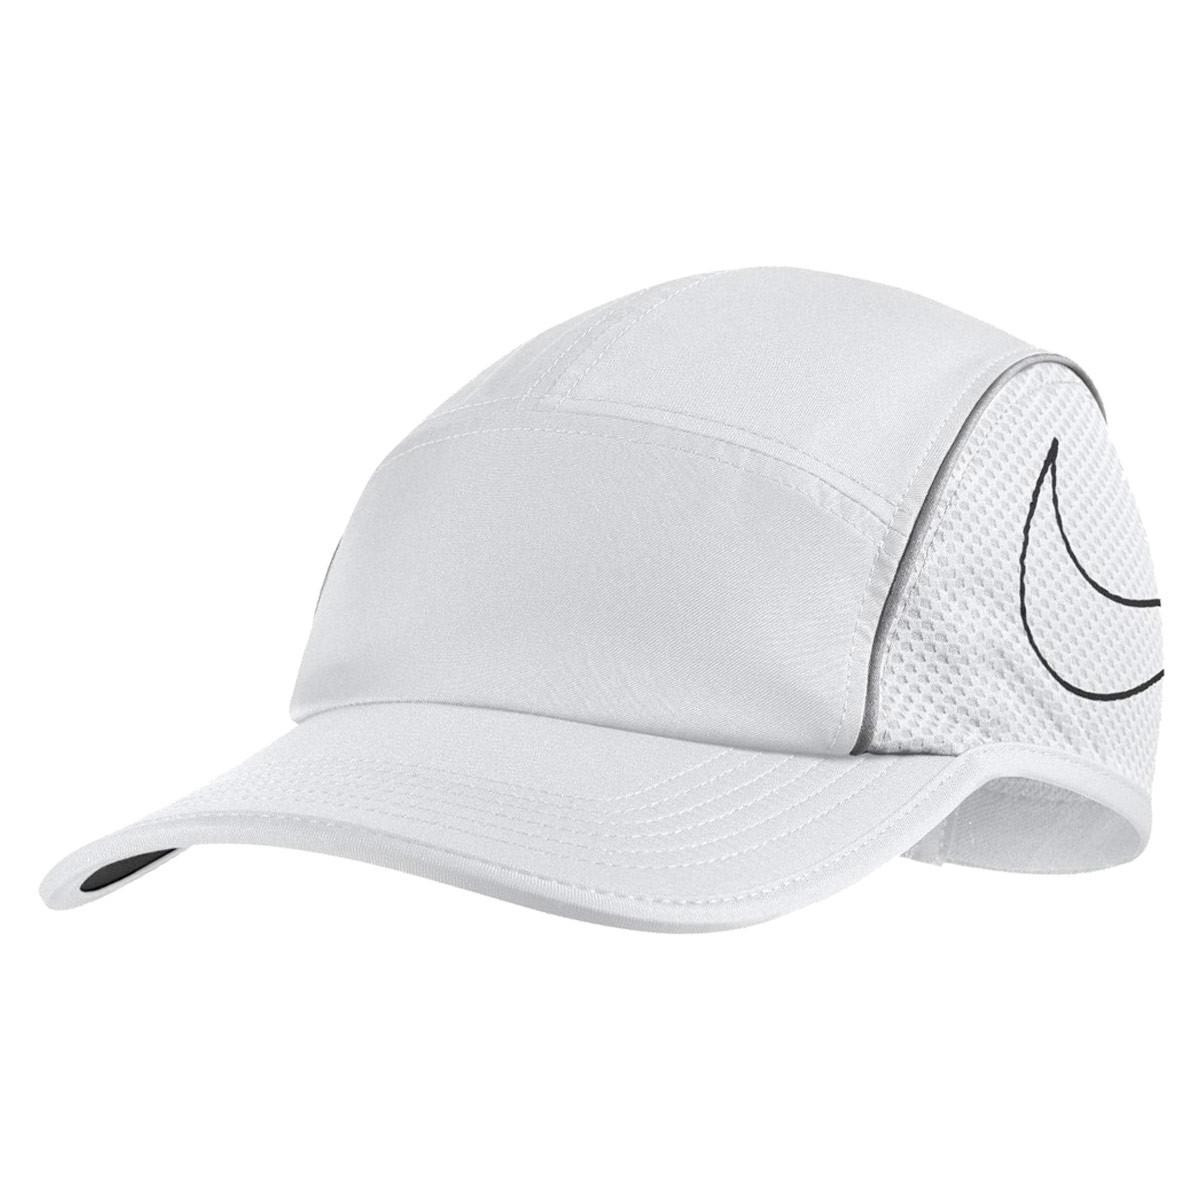 Nike AeroBill Running Cap - Headdress for Women - White  2da69c3a28a